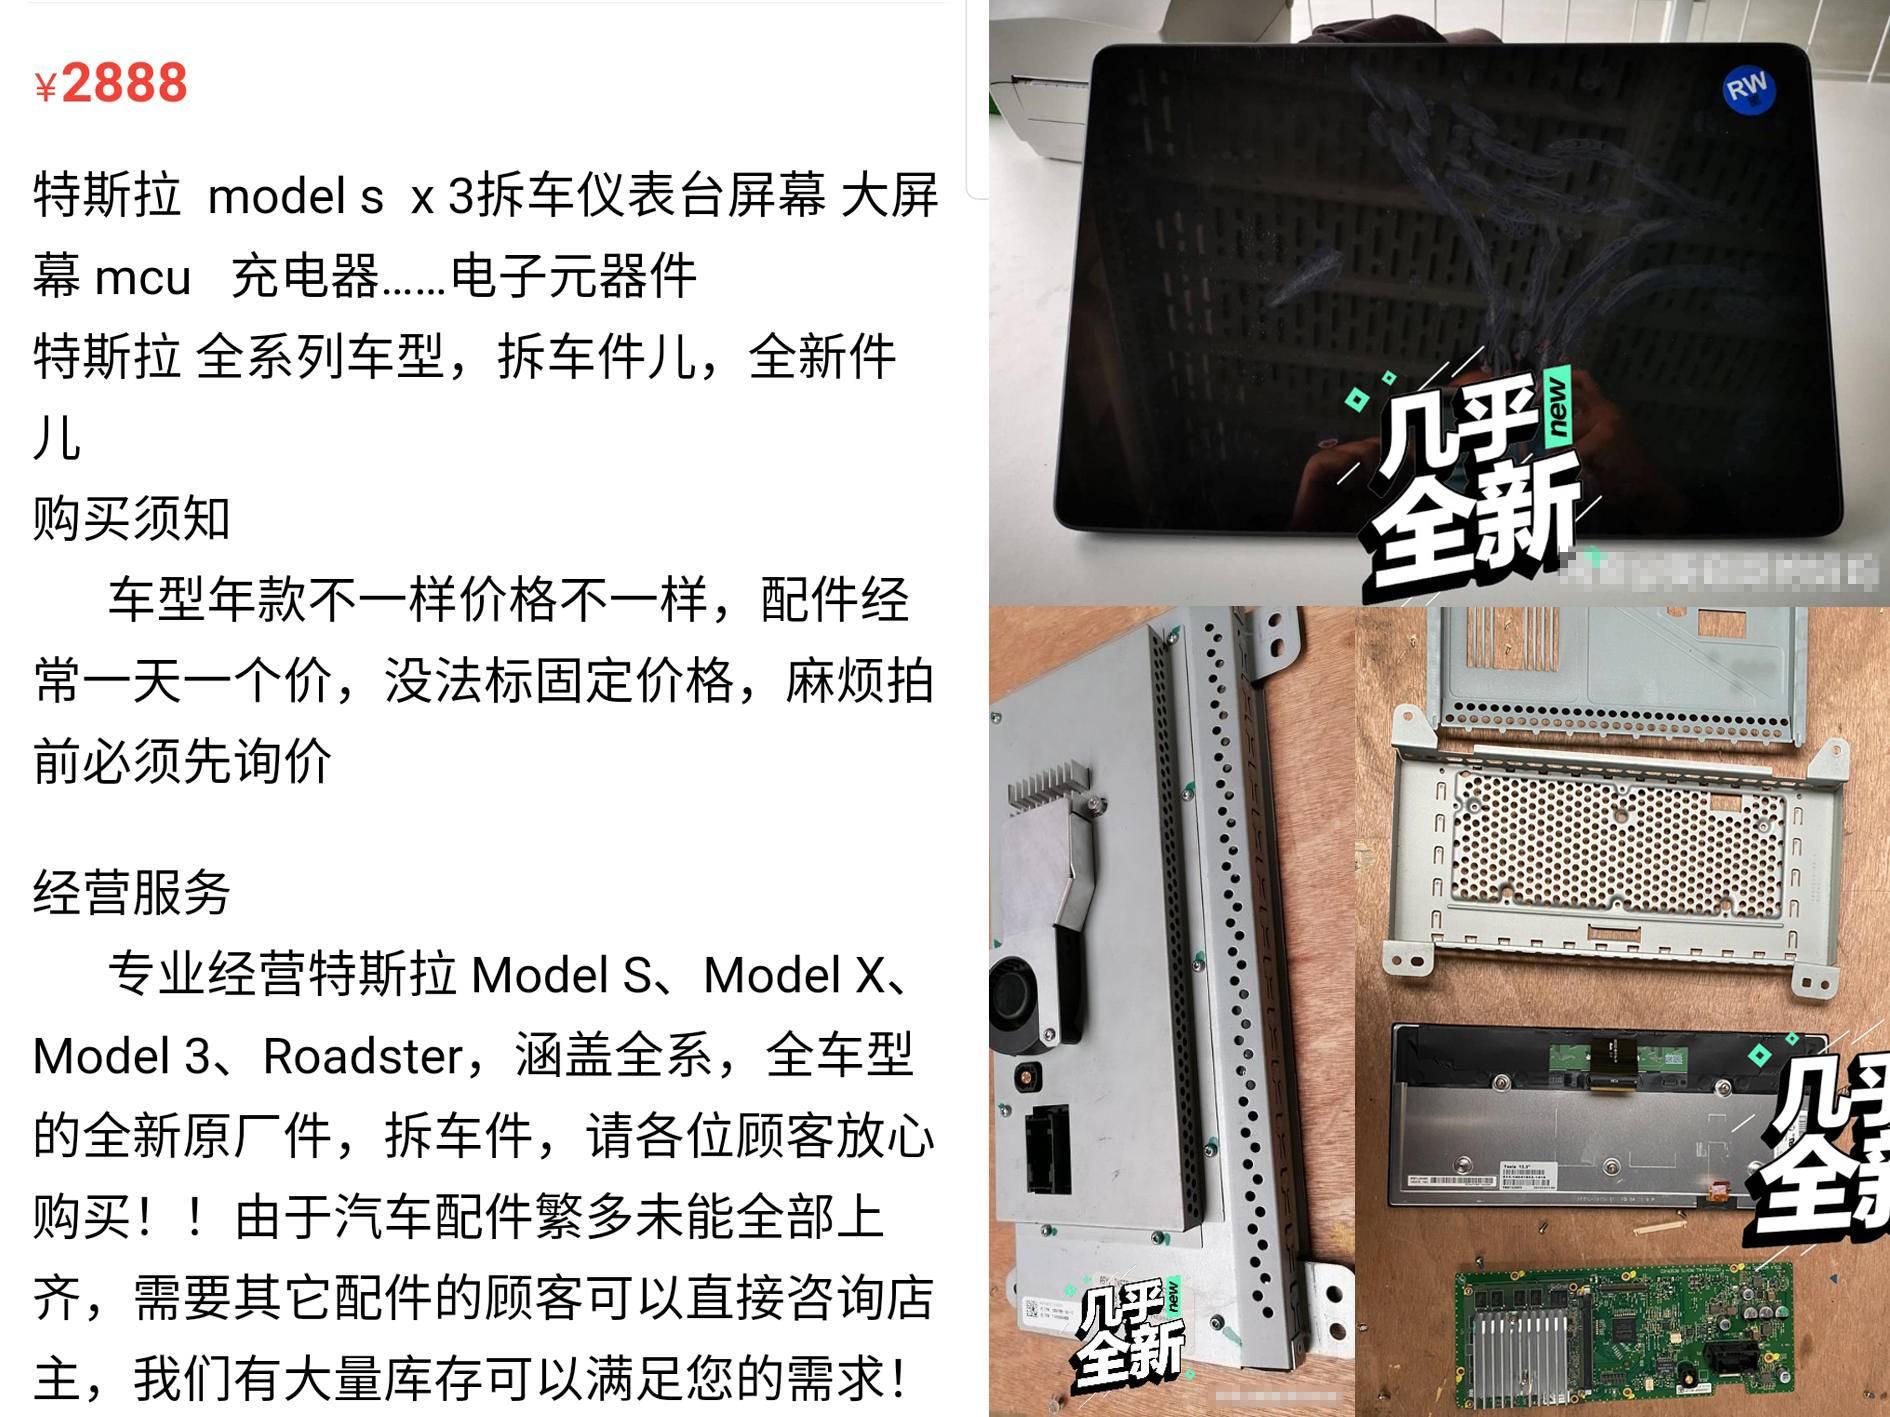 http://cools.qctt.cn/1589001608720.jpeg?imageMogr2/size-limit/1024k!